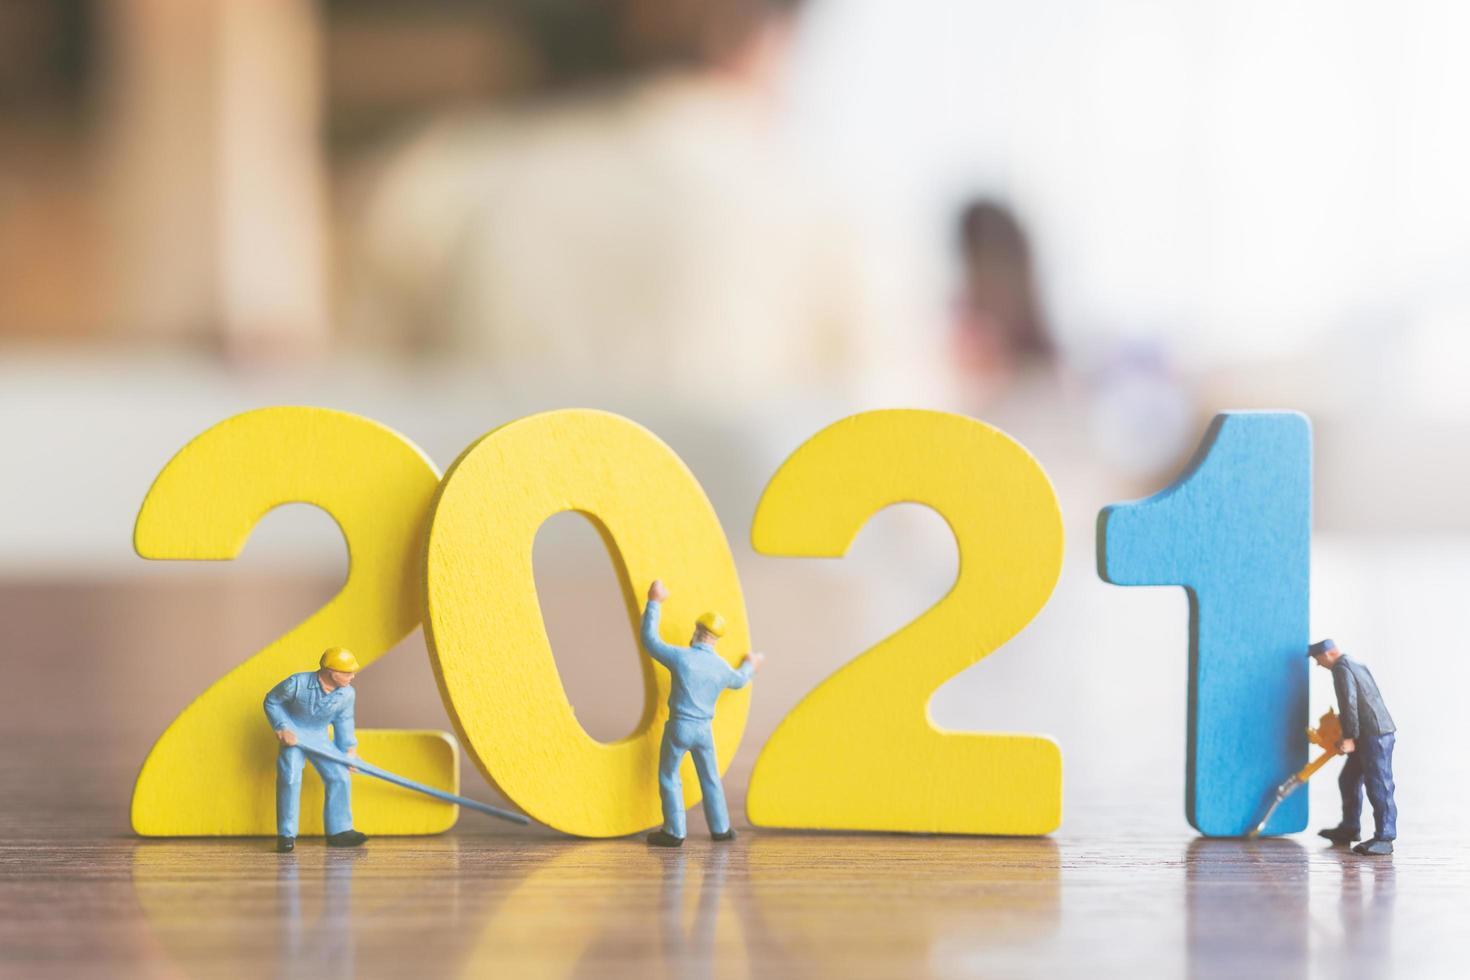 Figurilla en miniatura team building número de madera 2021 foto